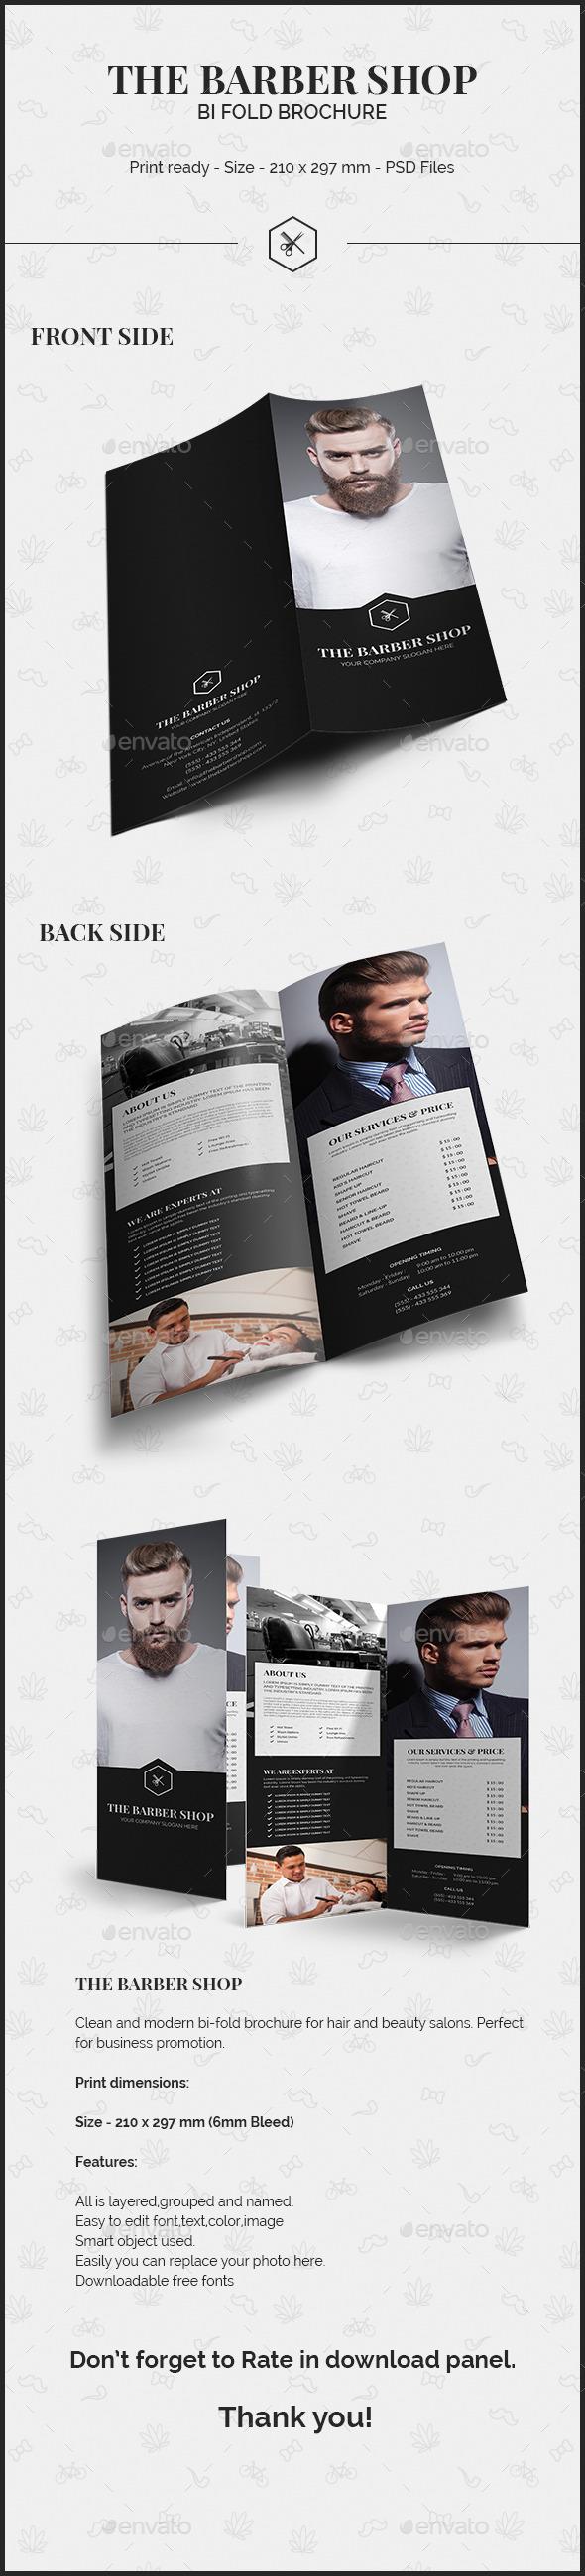 The Barber Shop Bi Fold Brochure - Brochures Print Templates